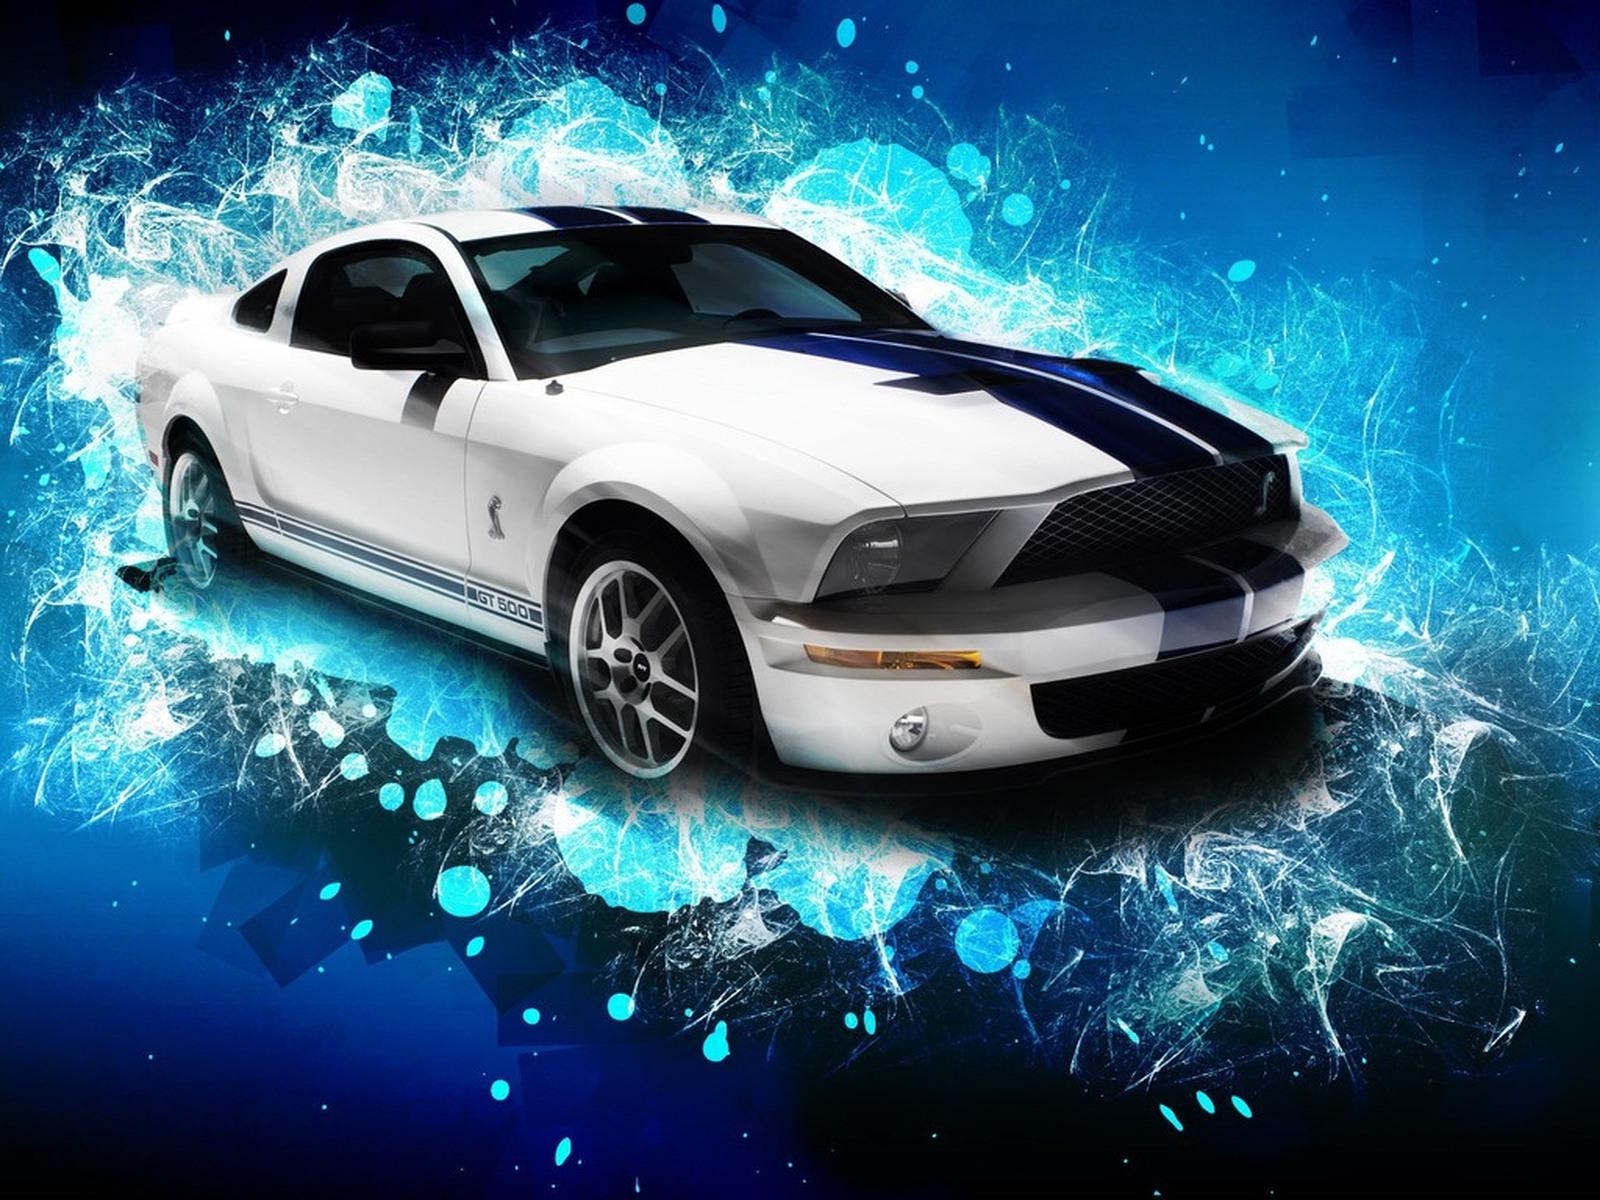 Mbanjur Blog Auto Wallpaper - Imagenes De Autos Deportivos Para Fondo De Pantalla , HD Wallpaper & Backgrounds